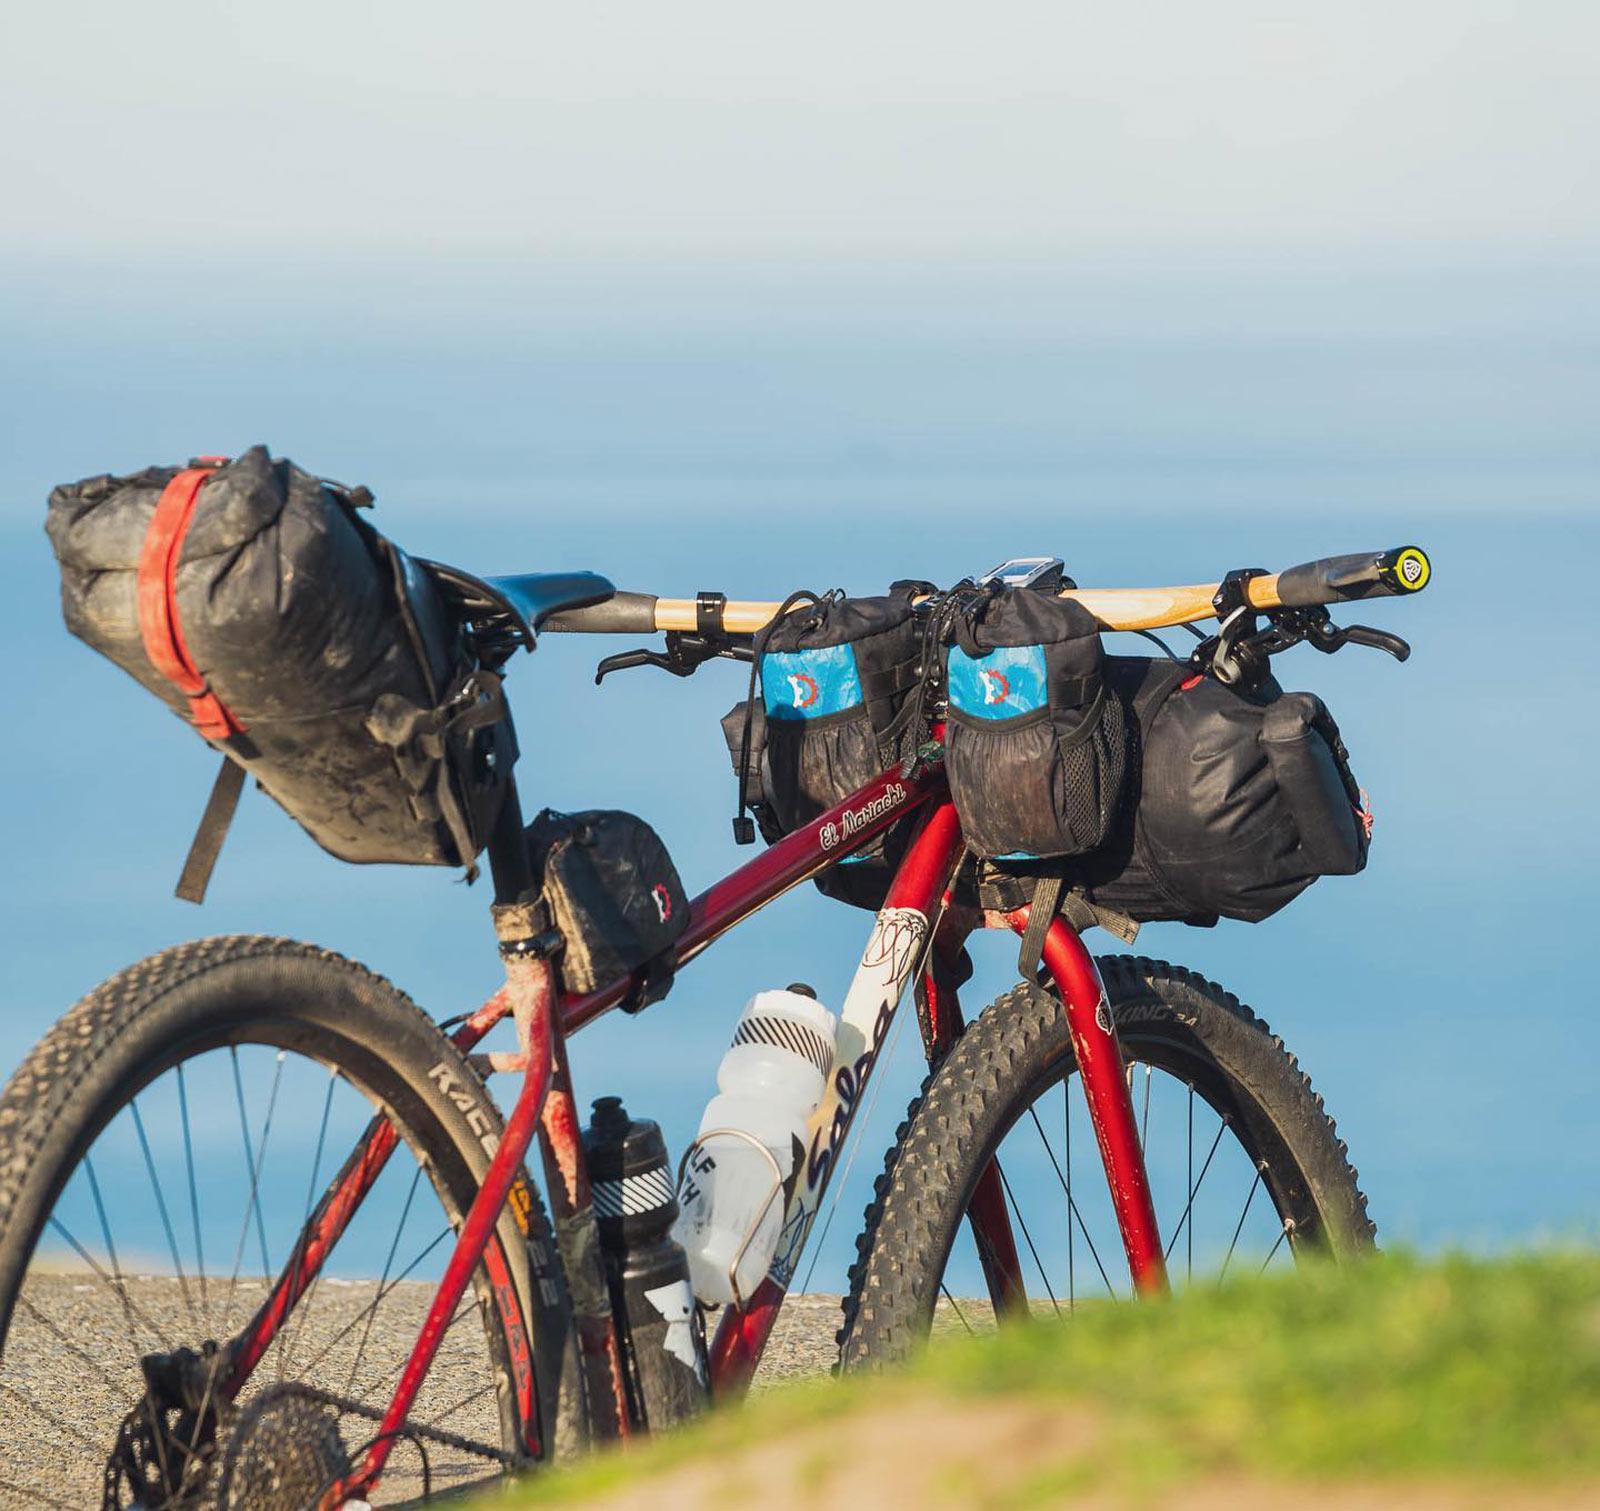 passchier gump bamboo handlebars bikepacking setup